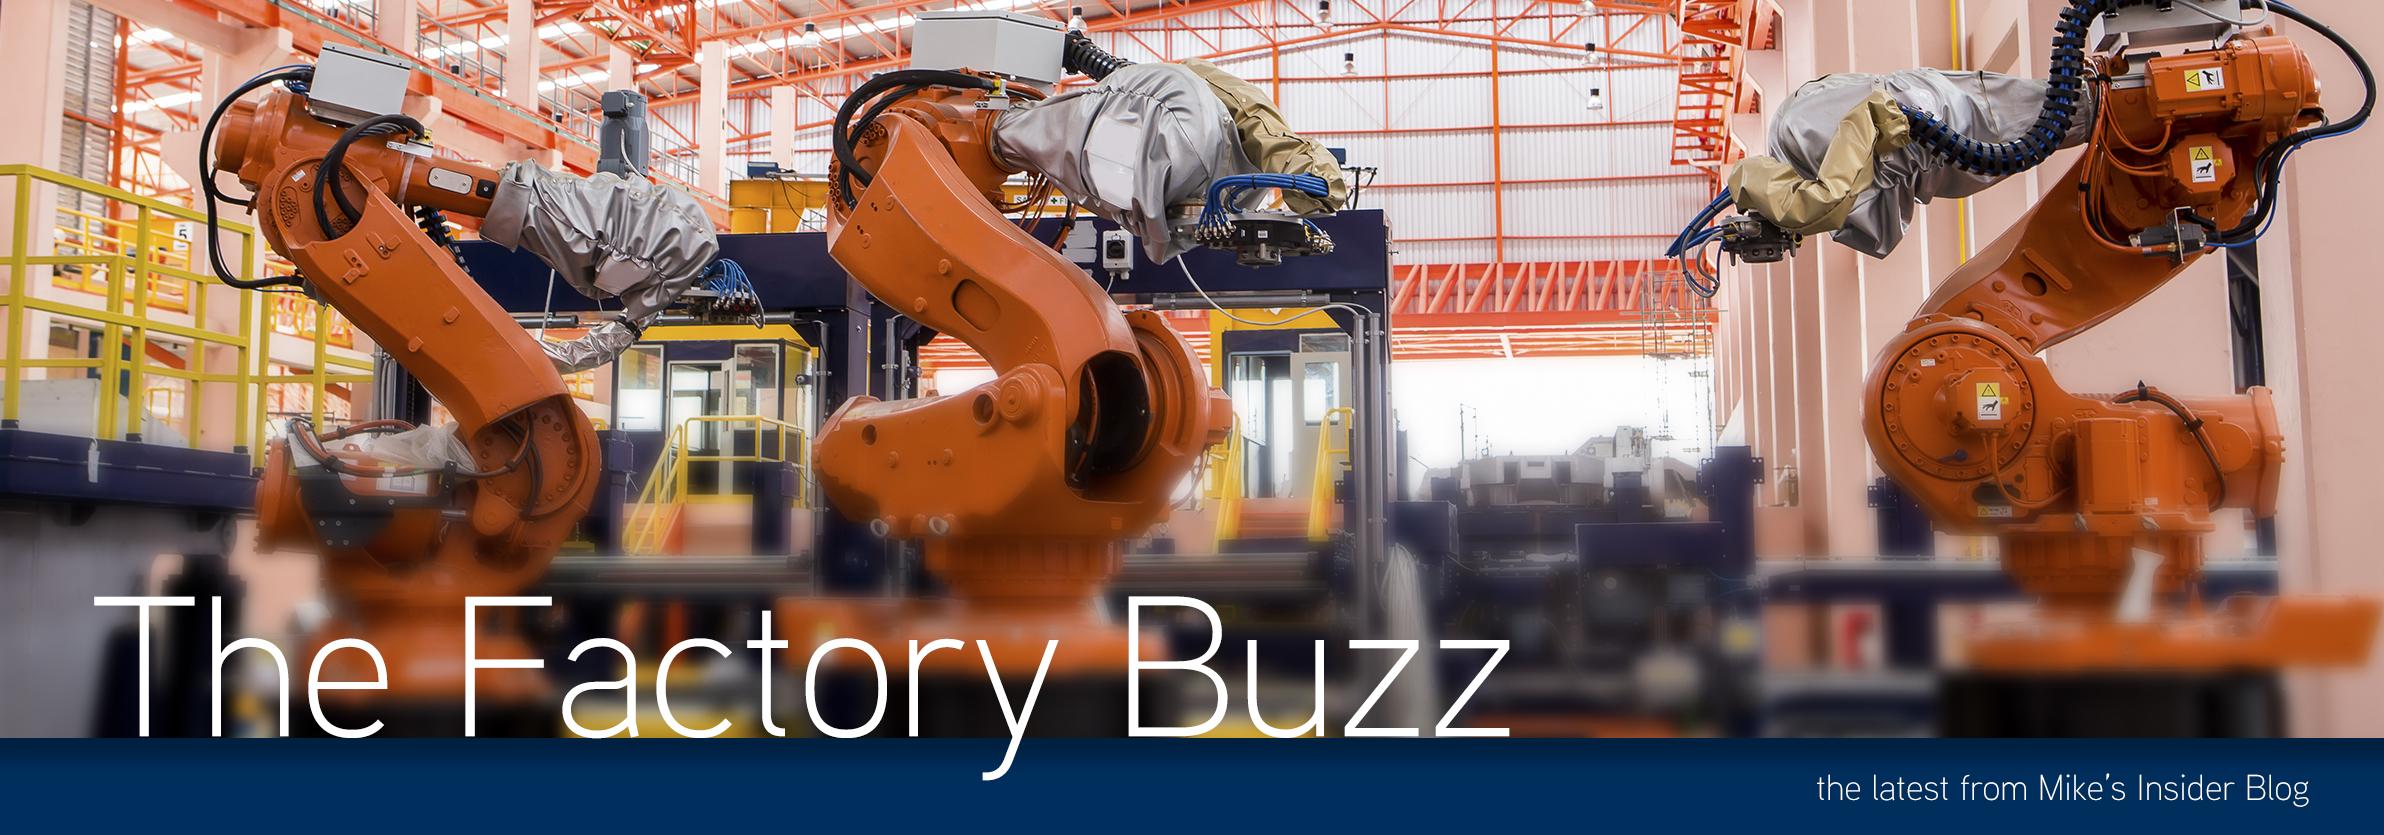 The Factory Buzz